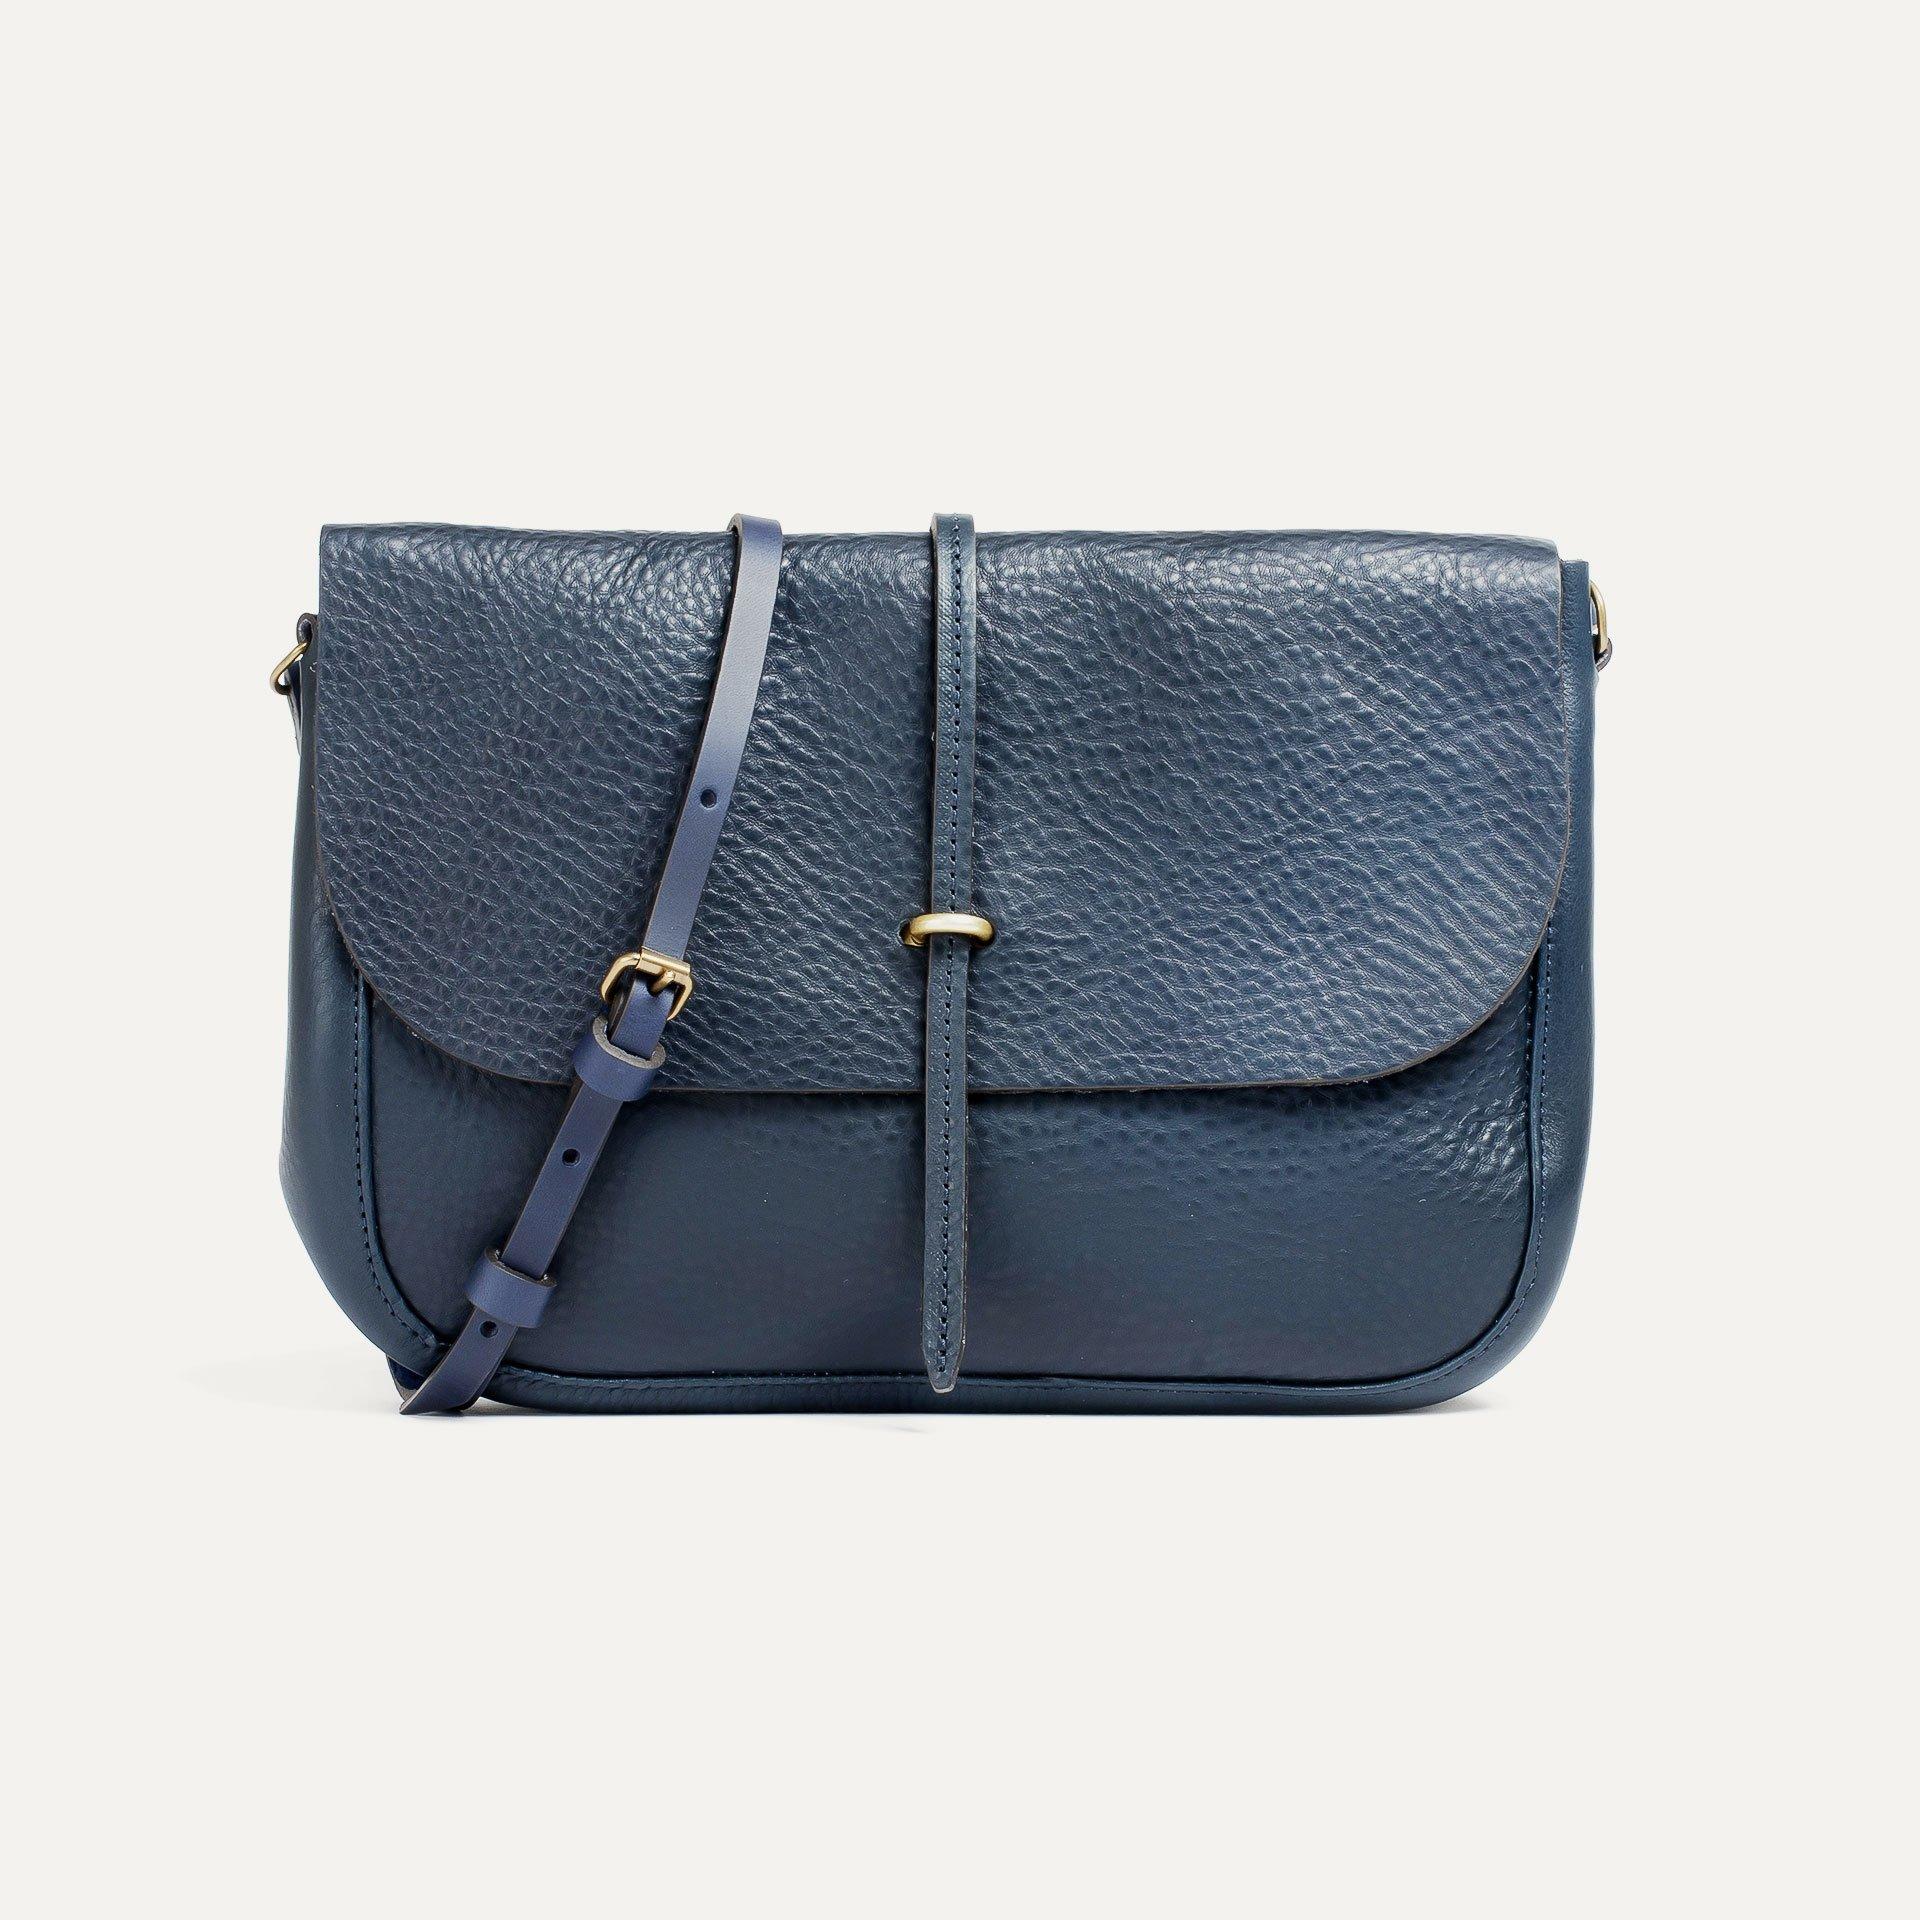 Pastel handbag - Navy Blue (image n°1)